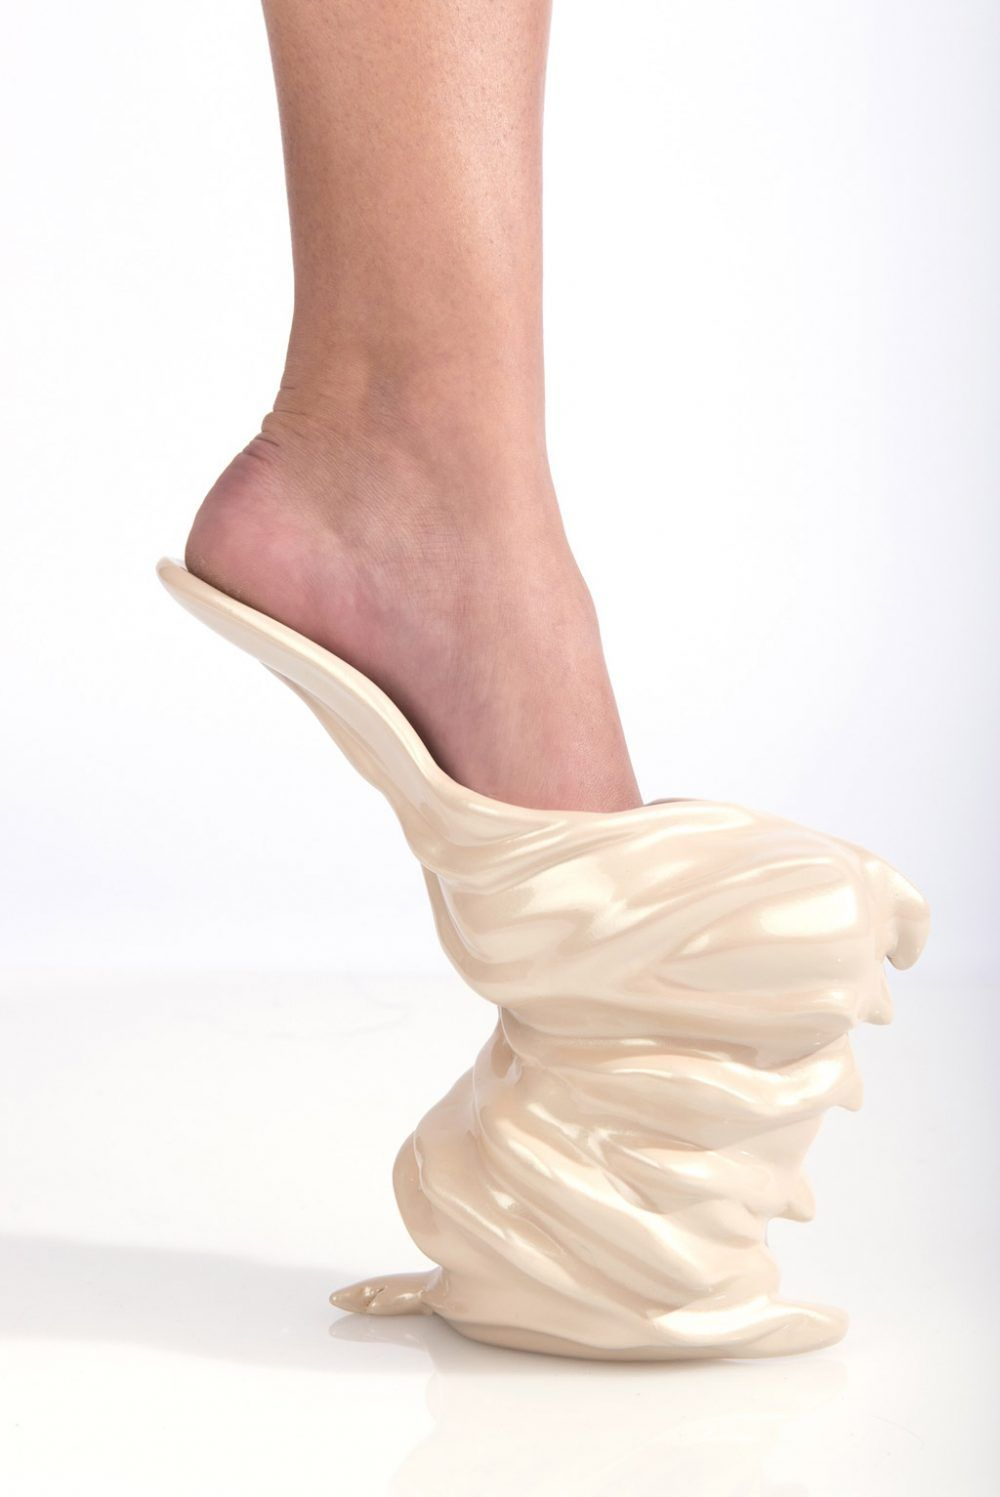 Footwear News, http://footwearnews.com/gallery/a-walk-of-art-visionary-shoes-exhibit-bezalel-academy-jerusalem-photos/#!5/nadin-ram-barococo-2015-2016-photographer-or-zehavi-mentor-eliora-ginsburg/